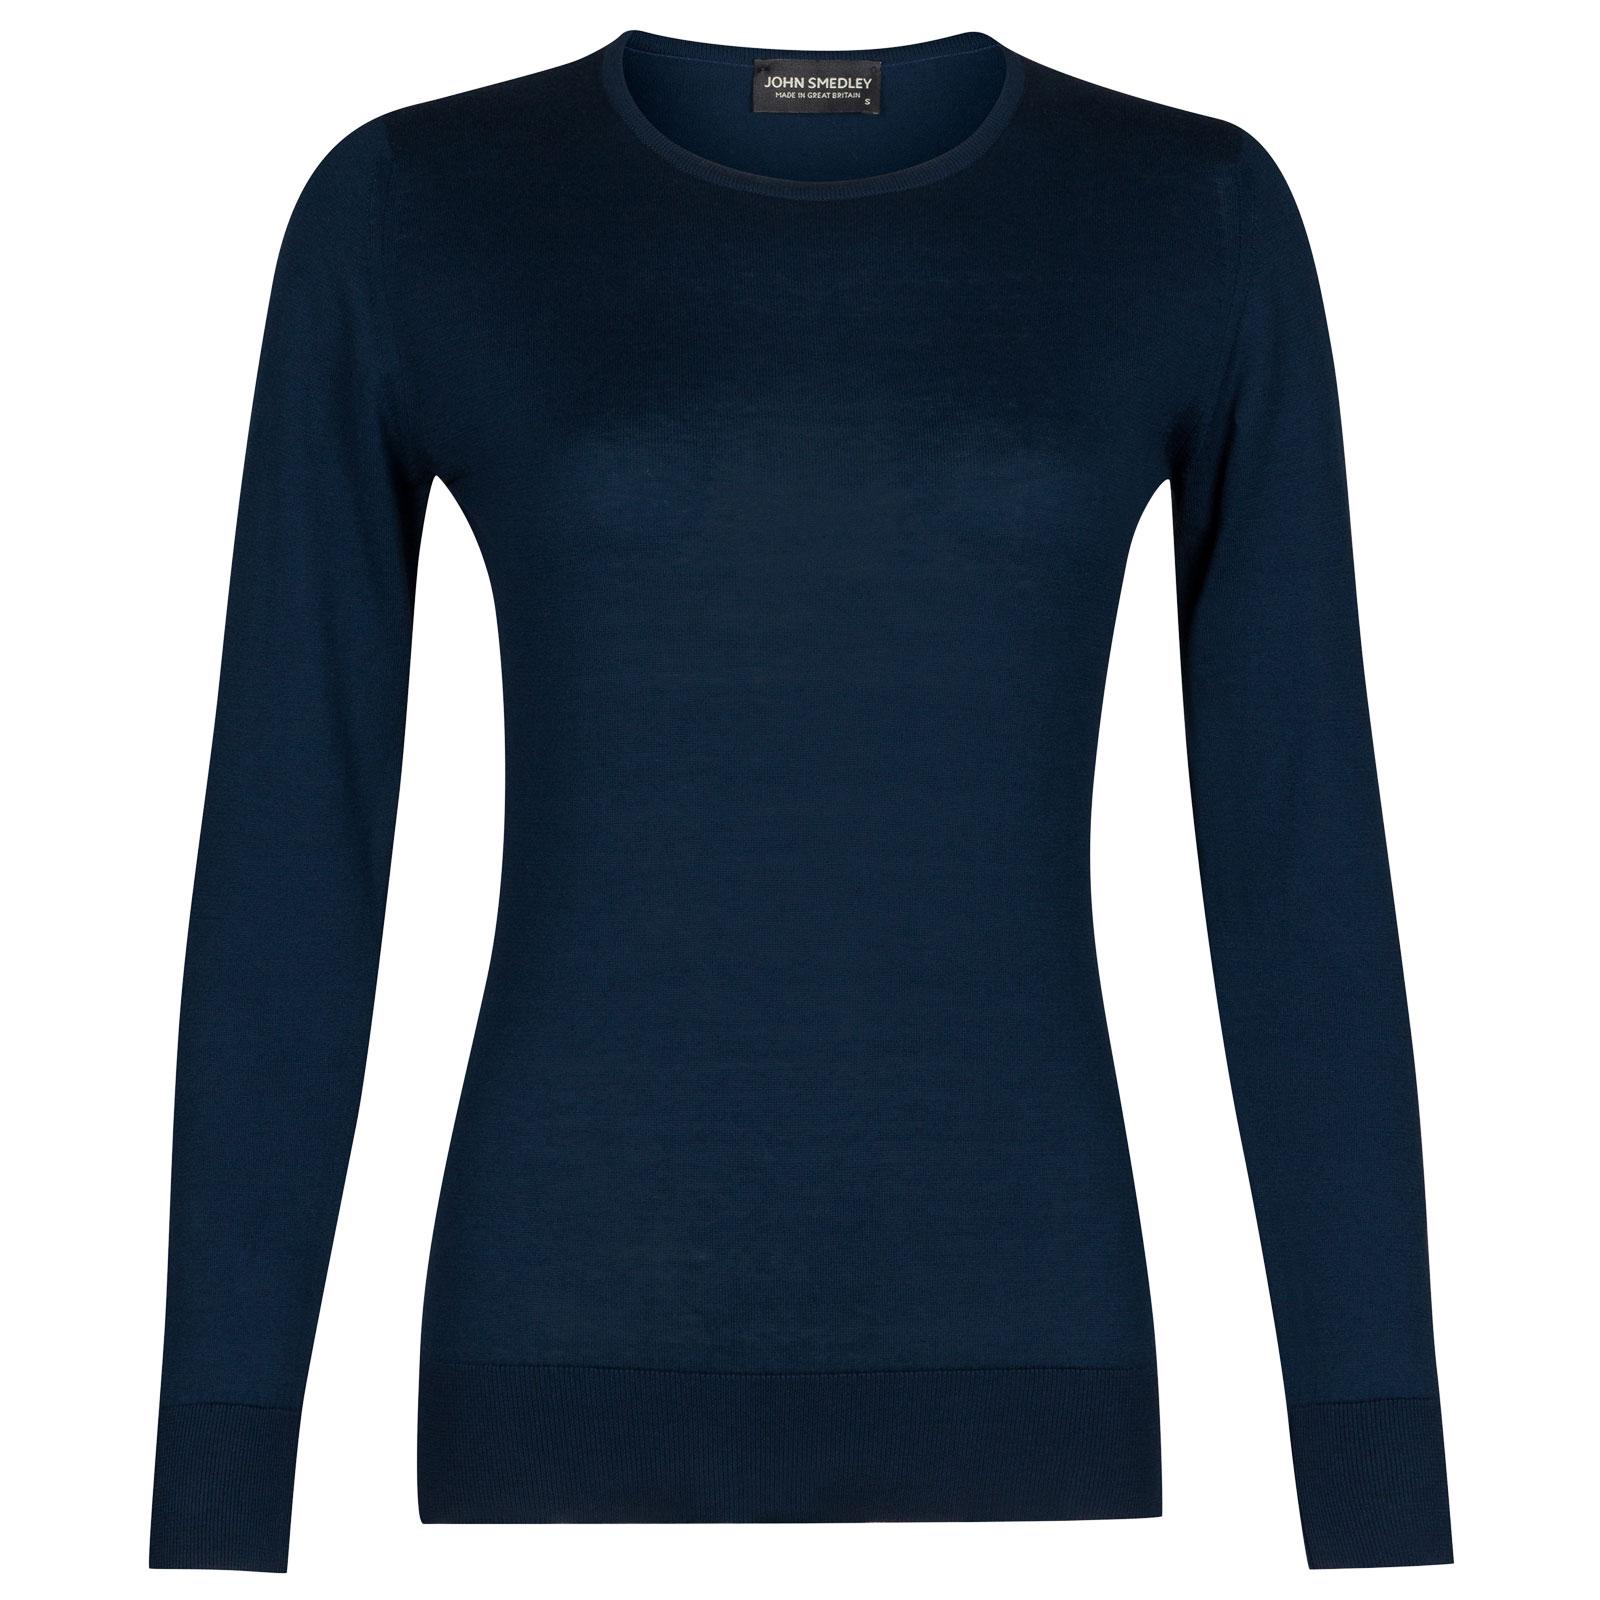 John Smedley paddington Sea Island Cotton Sweater in Indigo-XL